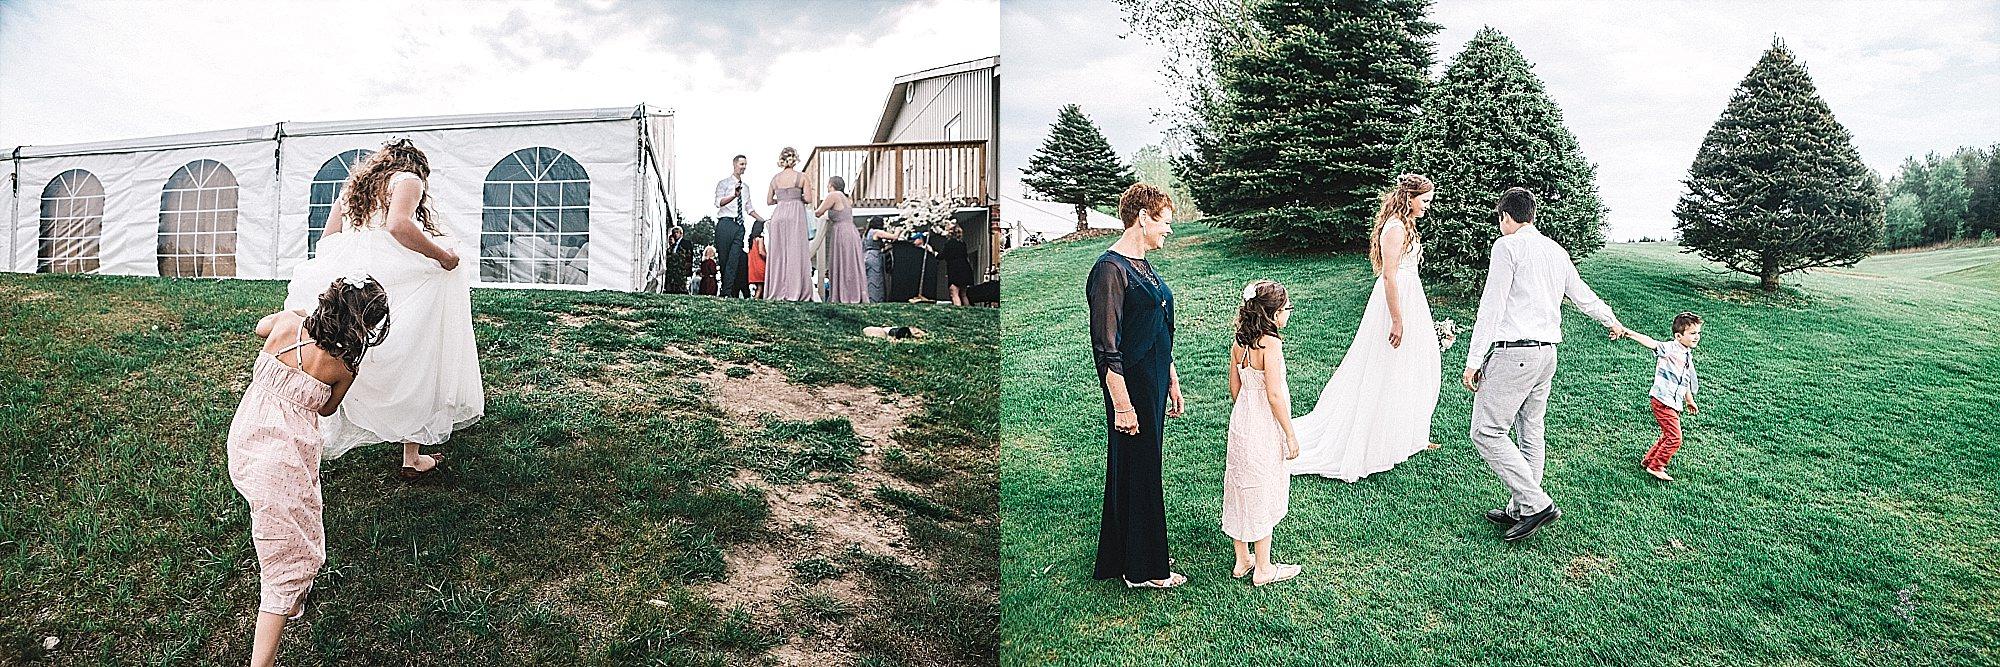 Destination Wedding_0183.jpg